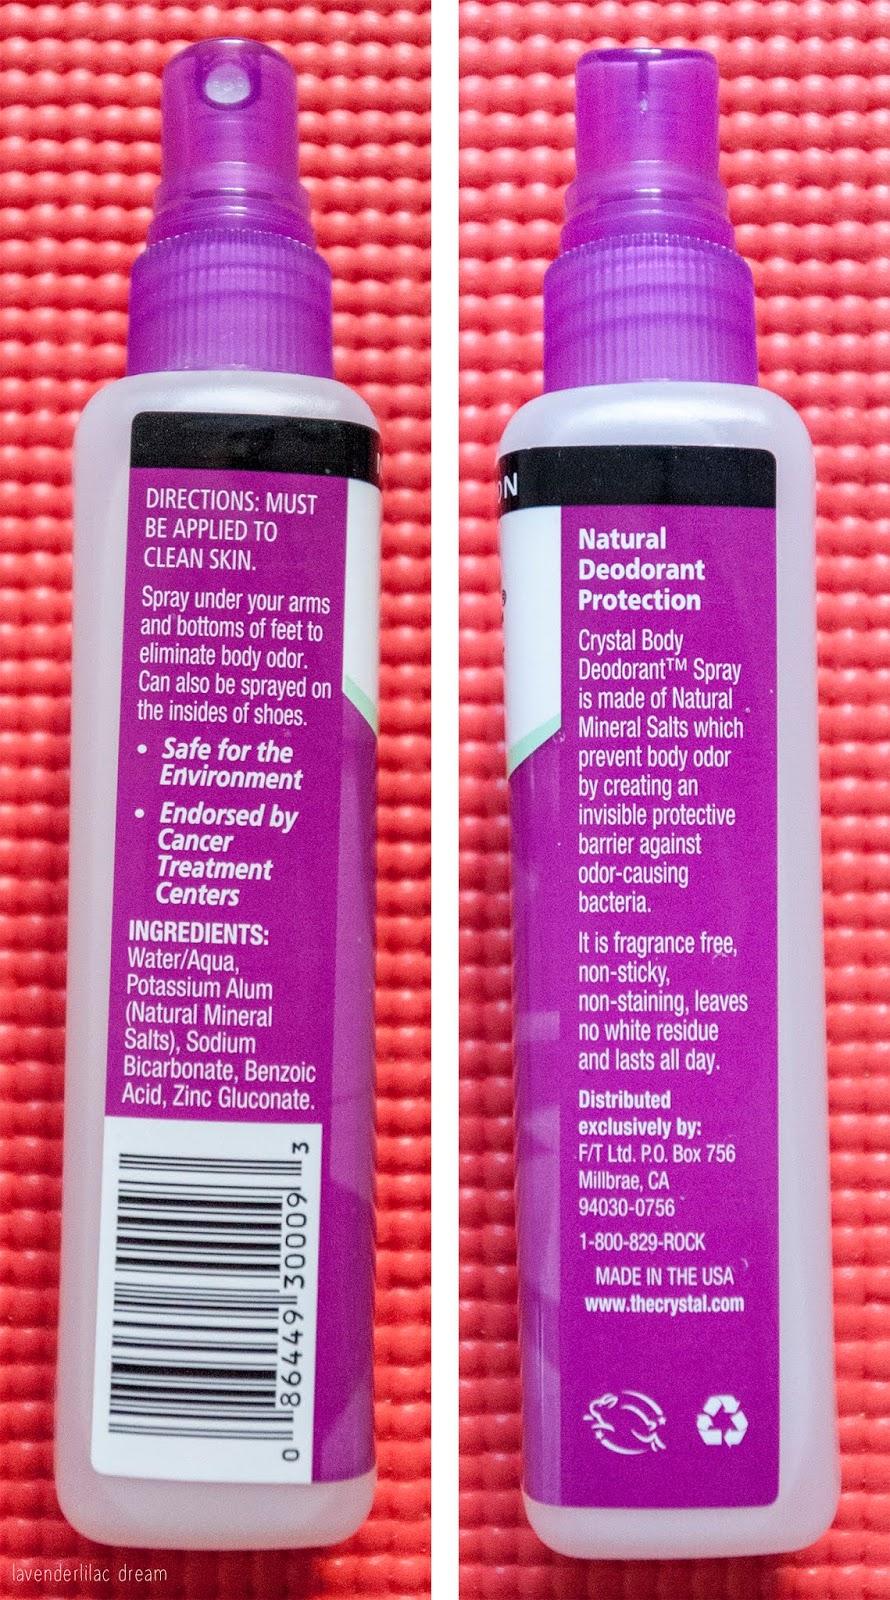 Current Faves, Crystal Body Deodorant Spray Label, Natural Aluminum-free Deodorant